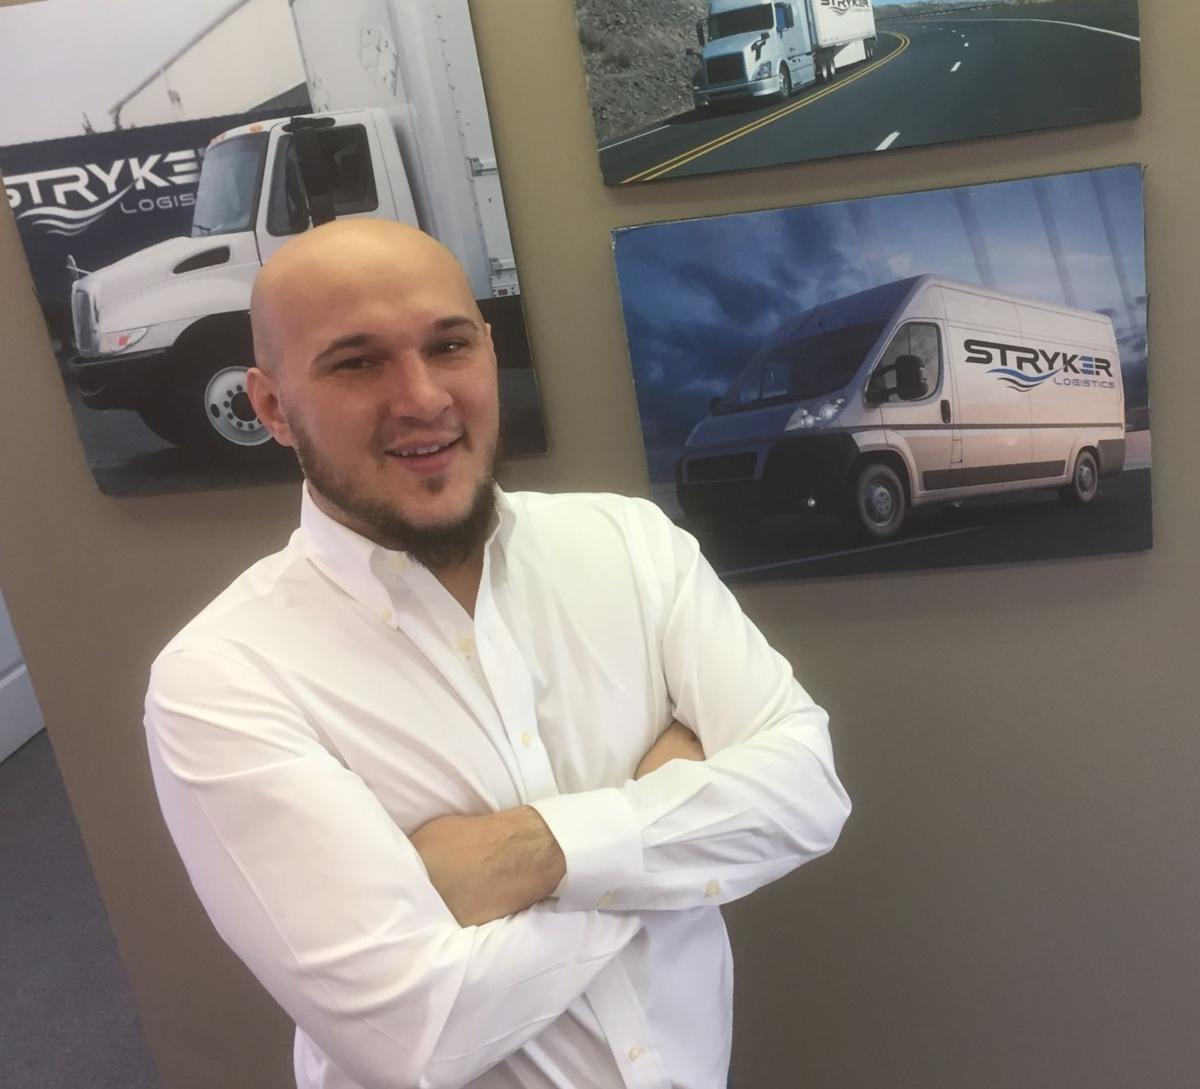 Bowling Green's Stryker Logistics makes list of top